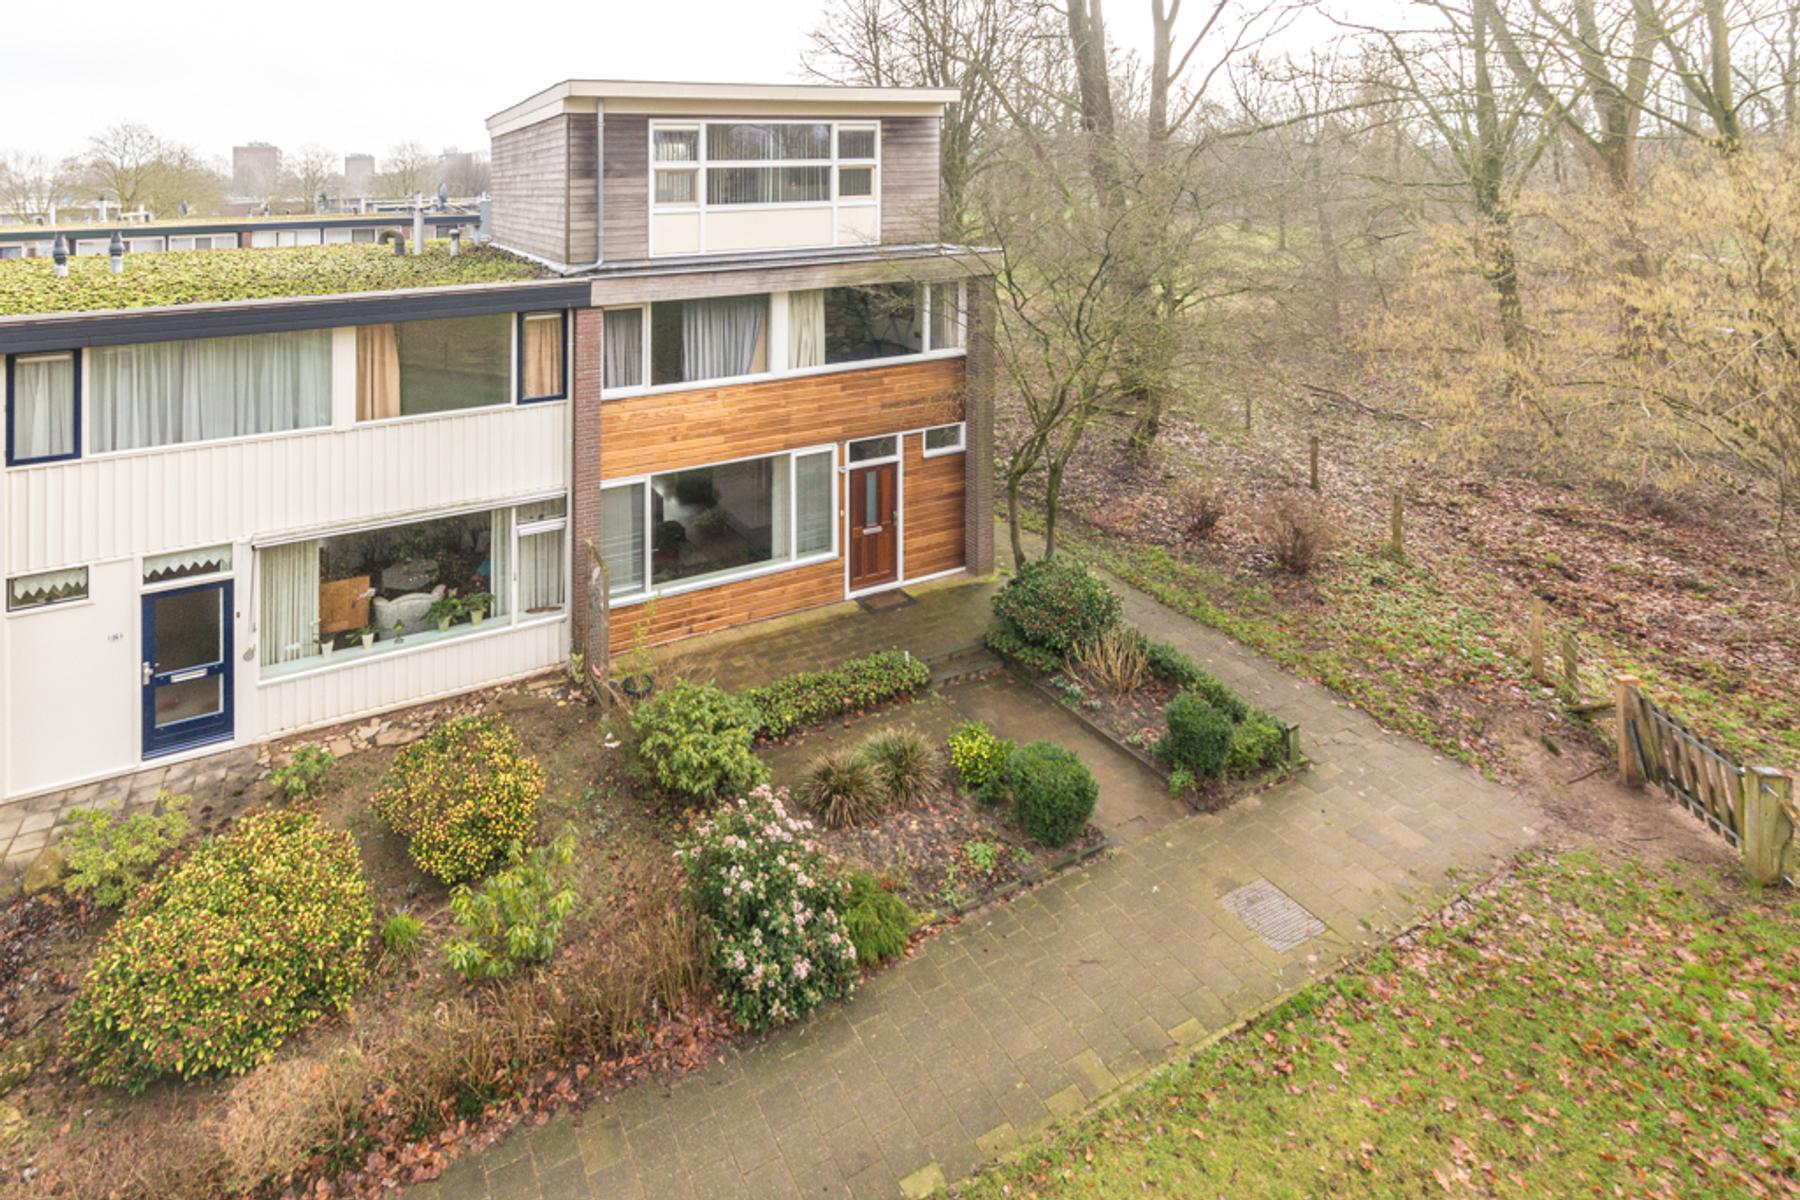 Eduard Schilderinkstraat 18 in Doetinchem 7002 JE: Woonhuis te koop ...